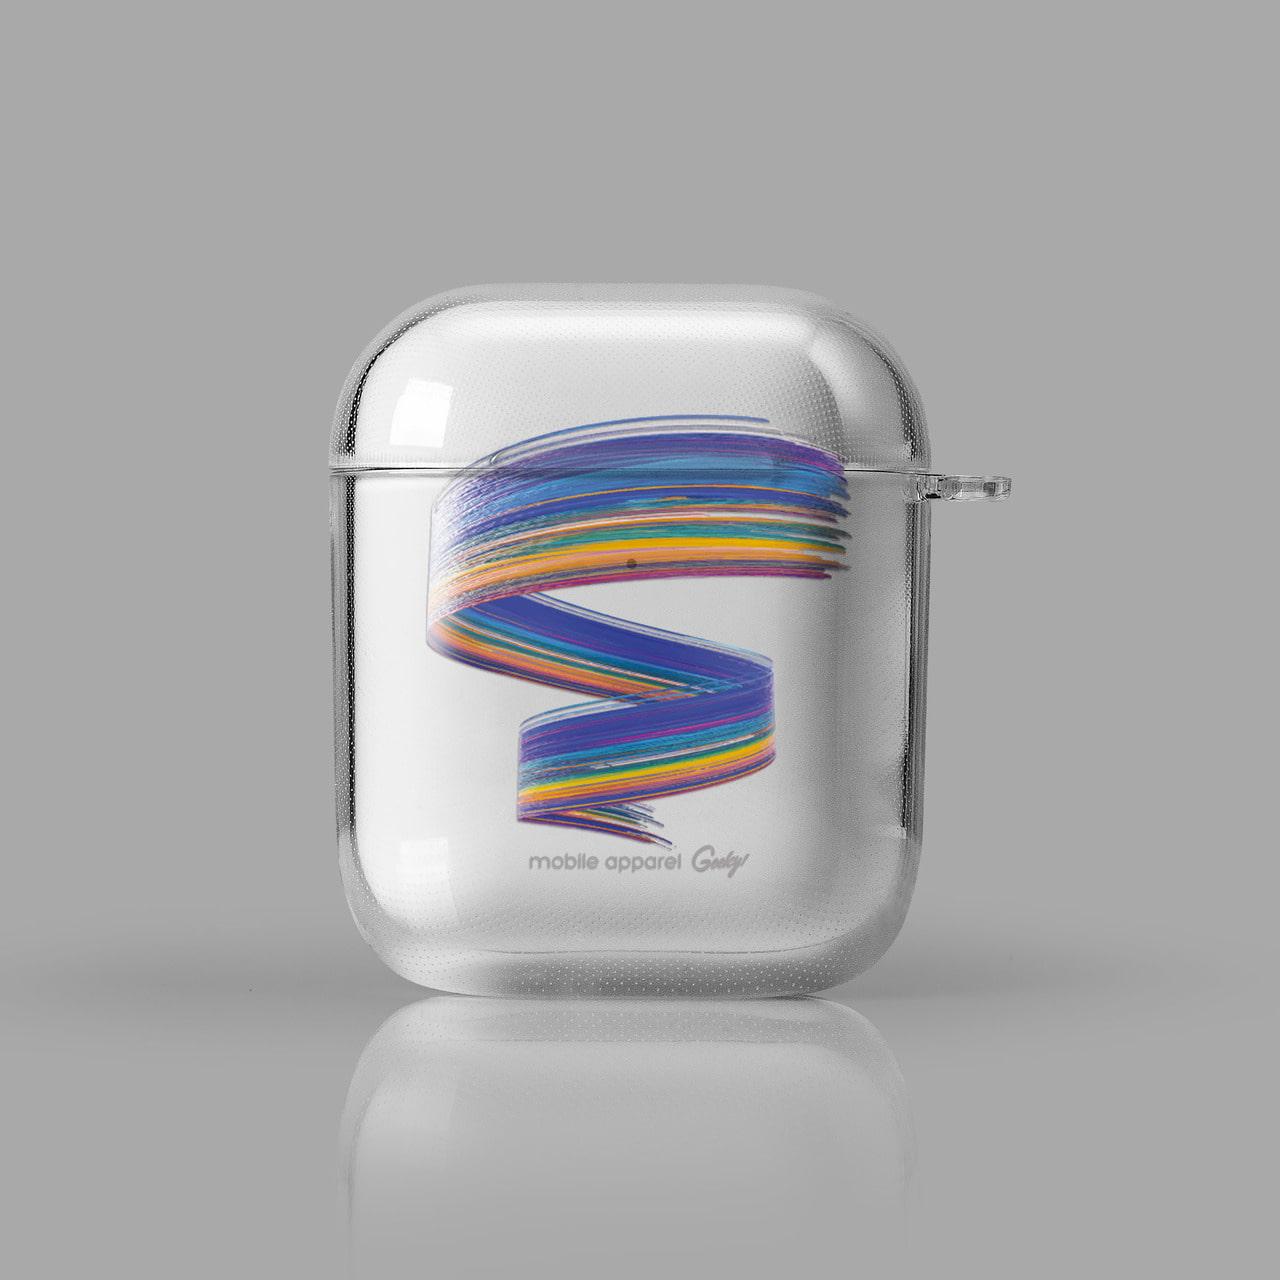 [Airpods cases] Simplicity No.05